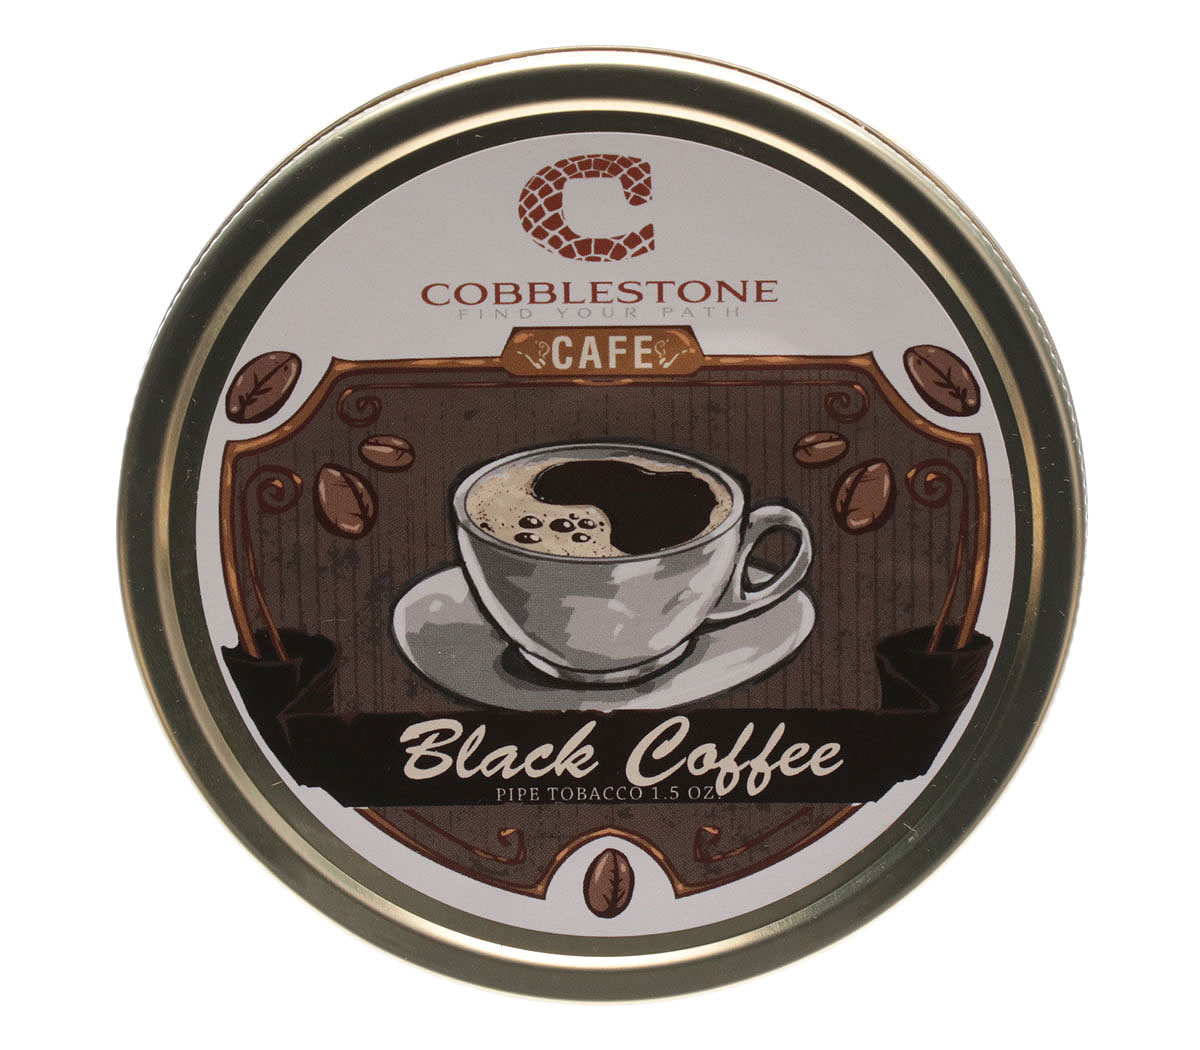 Cobblestone Cafe Black Coffee 1.75oz